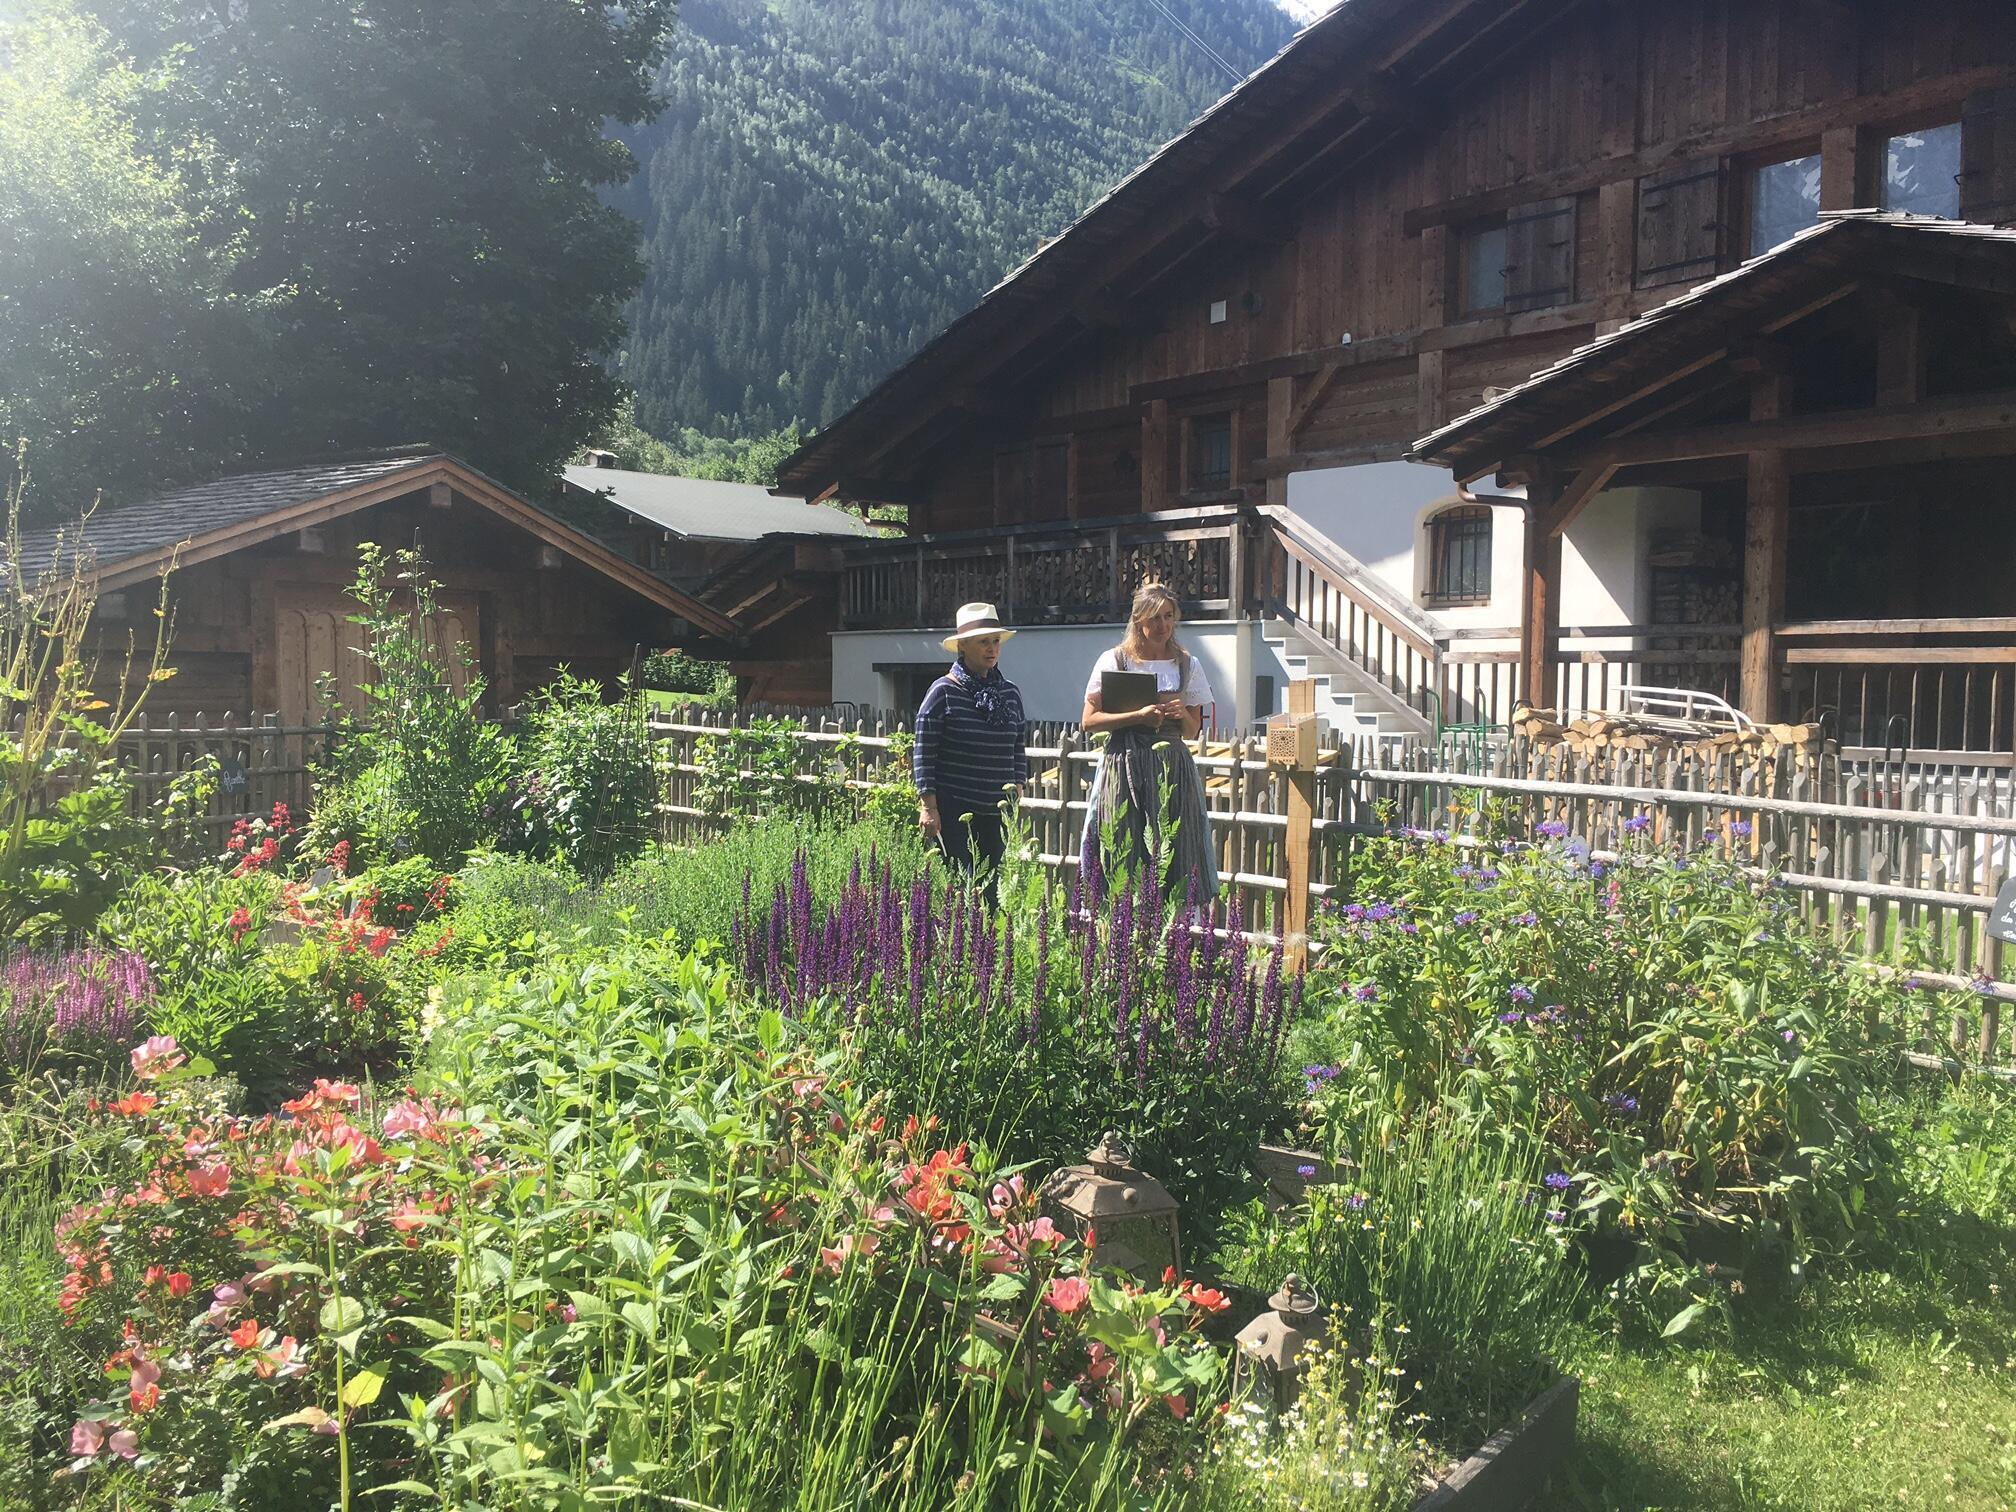 Hermitage Paccard 等旅館在花園中種植調料植物